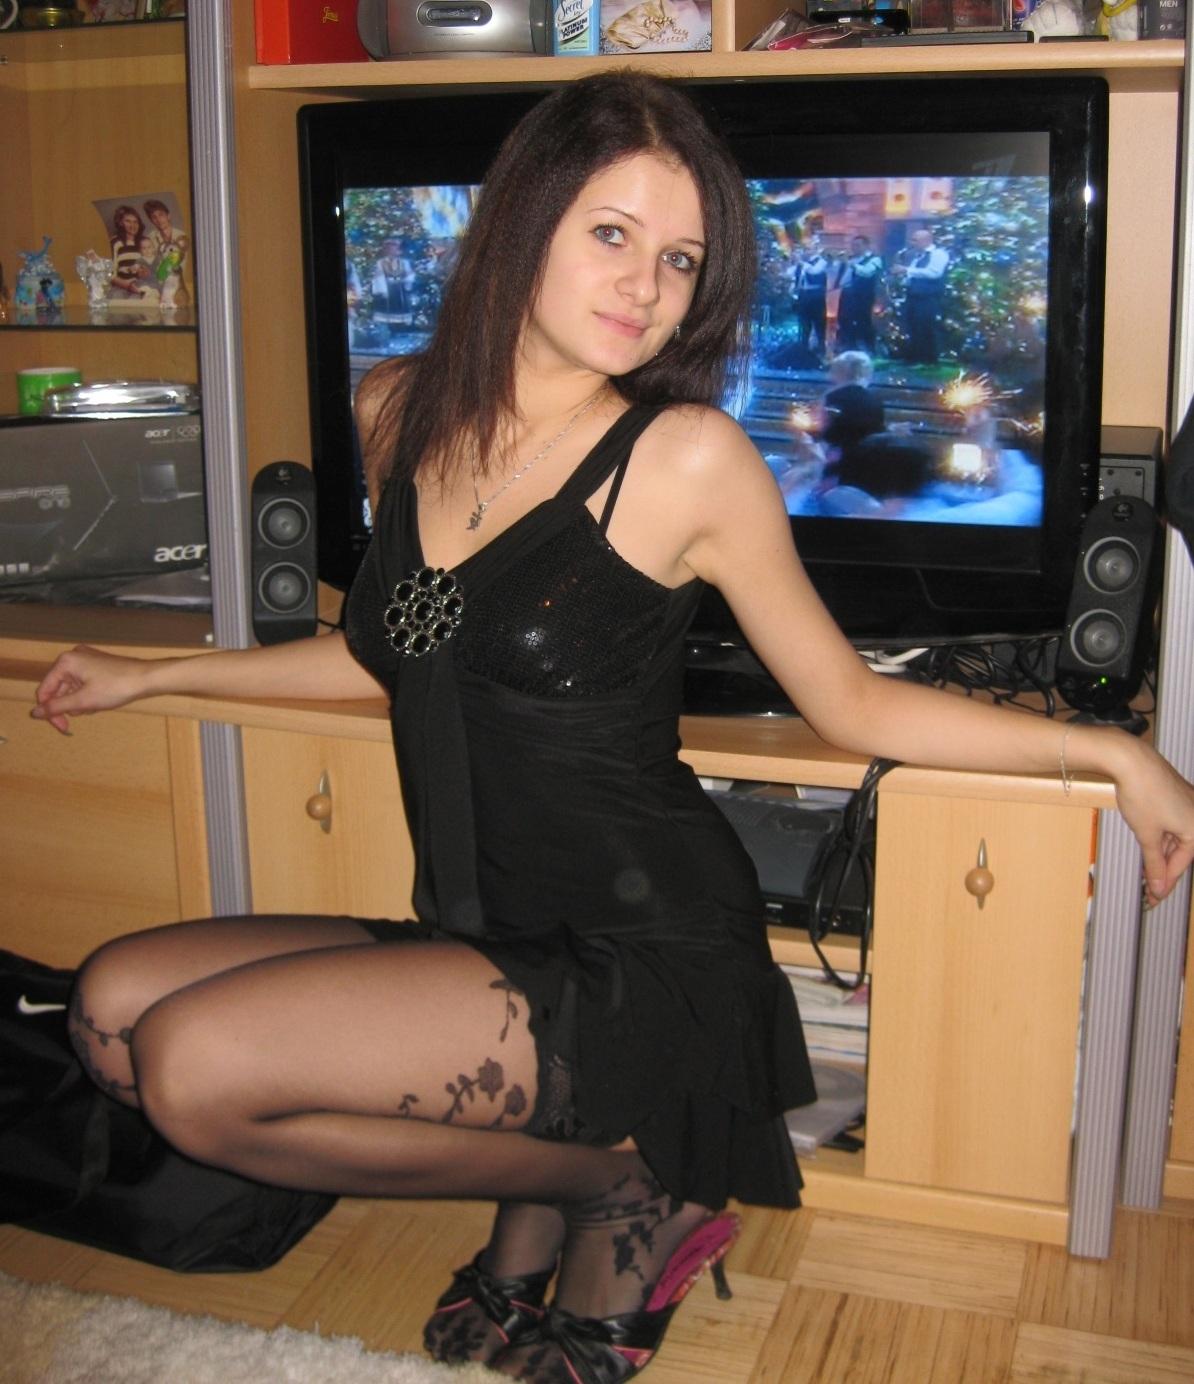 foto-domashnie-russkih-devchonok-smotret-filmi-onlayn-porno-molodih-s-starimi